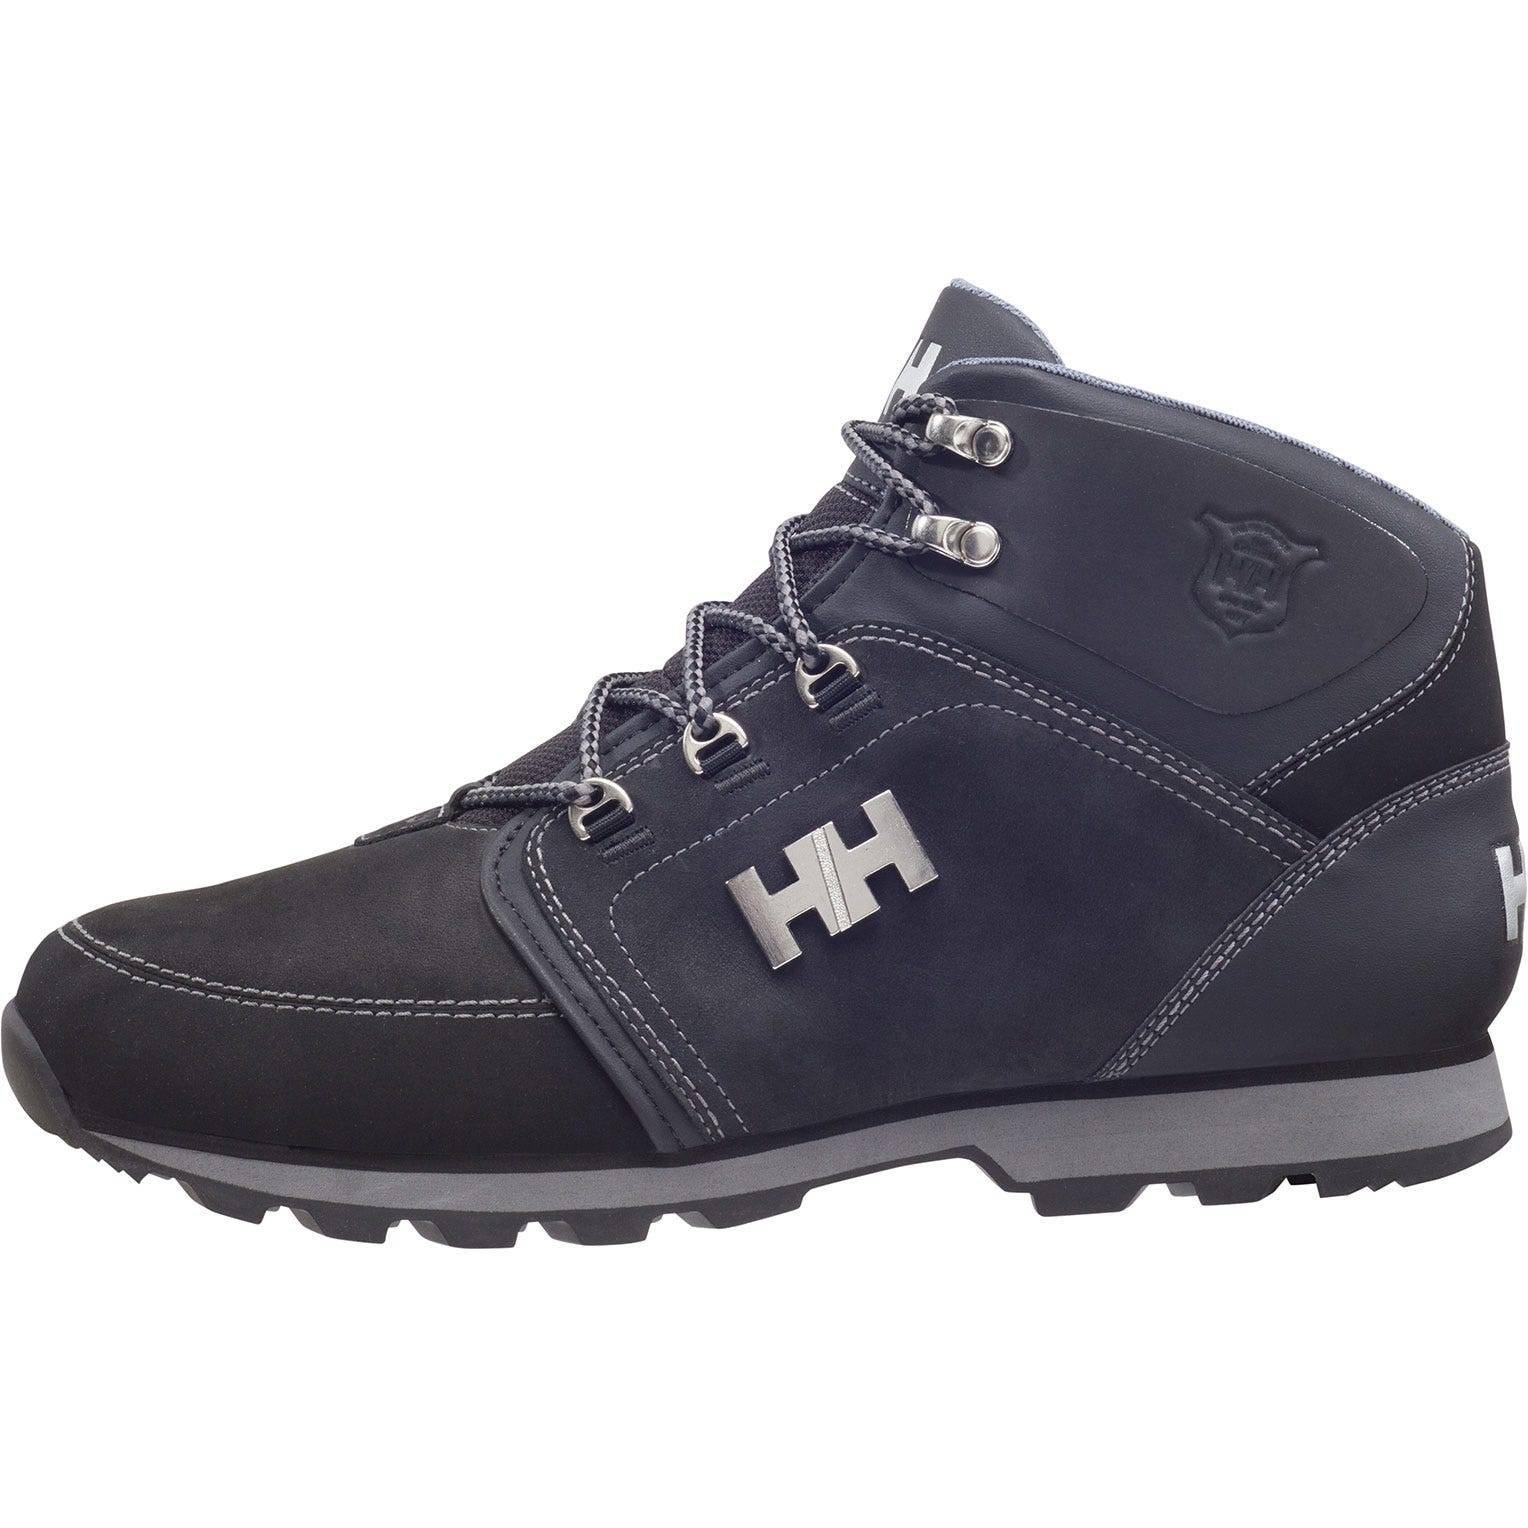 Helly Hansen Koppervik Mens Winter Boot Black 45/11